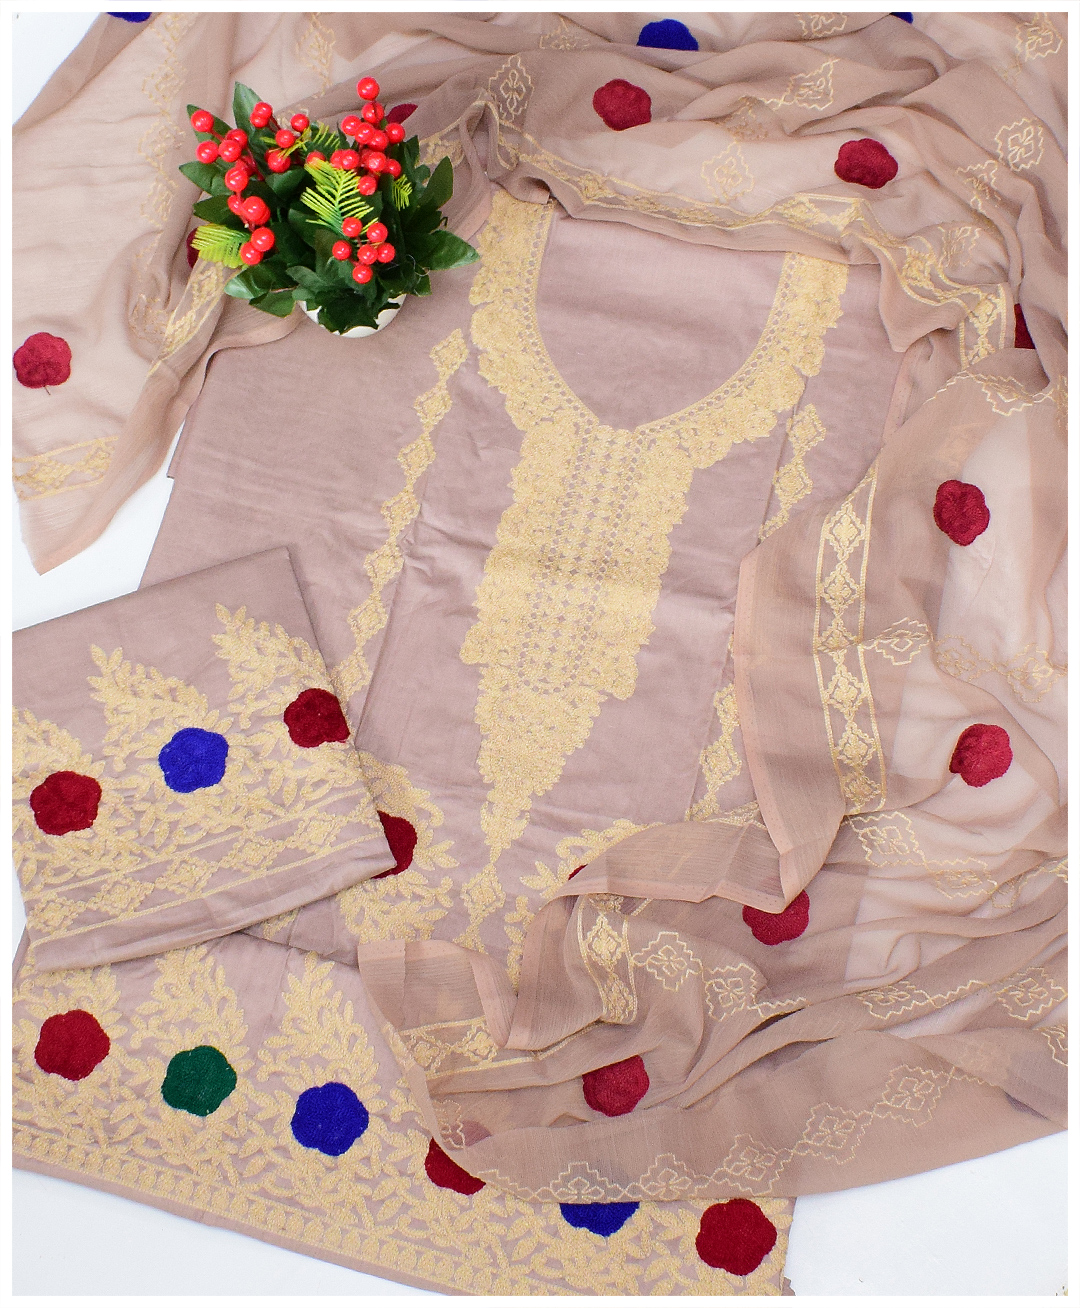 3 PCs Un-Stitched Lawn Skin Aari Work Embroidery Fancy Suits With Chiffon Dupatta – QA304H3